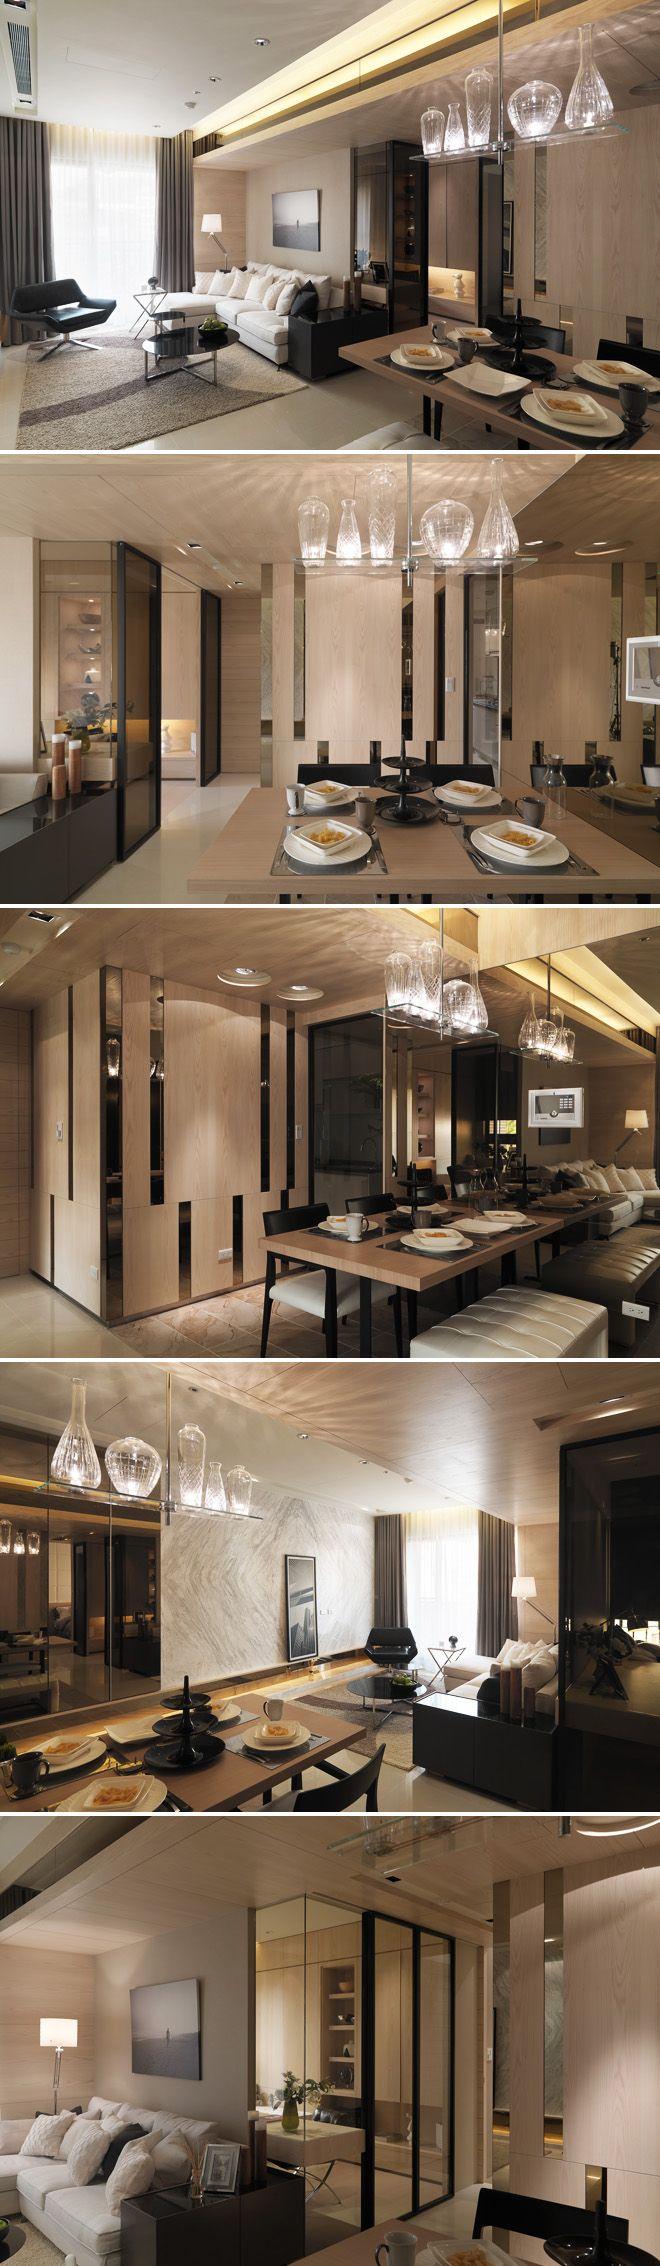 Contemporary design architecture interior fantasia also my rh pinterest